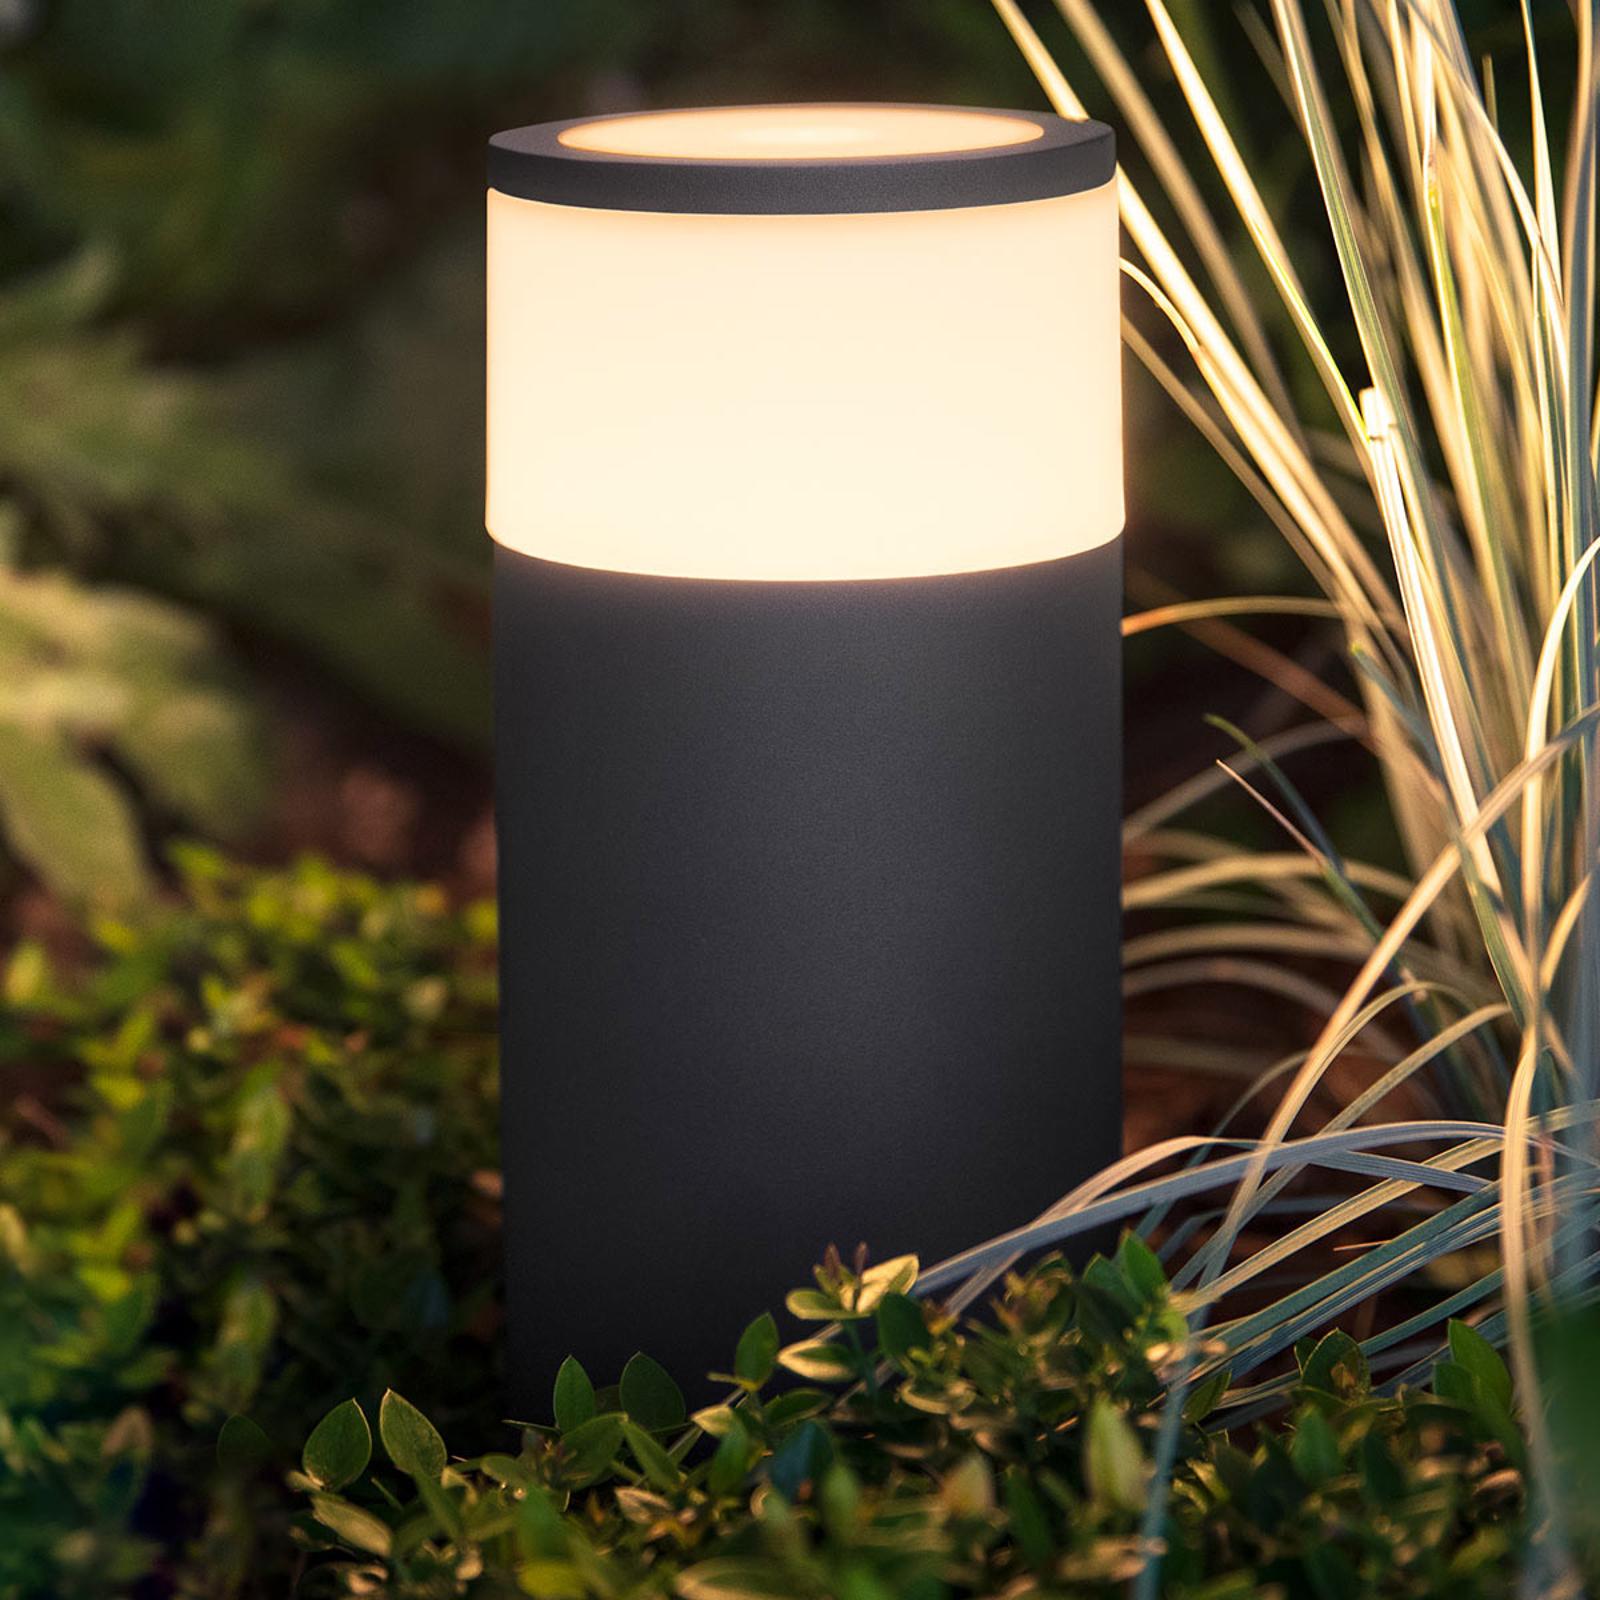 Philips Hue-LED-sokkellampe Calla grunnpakke